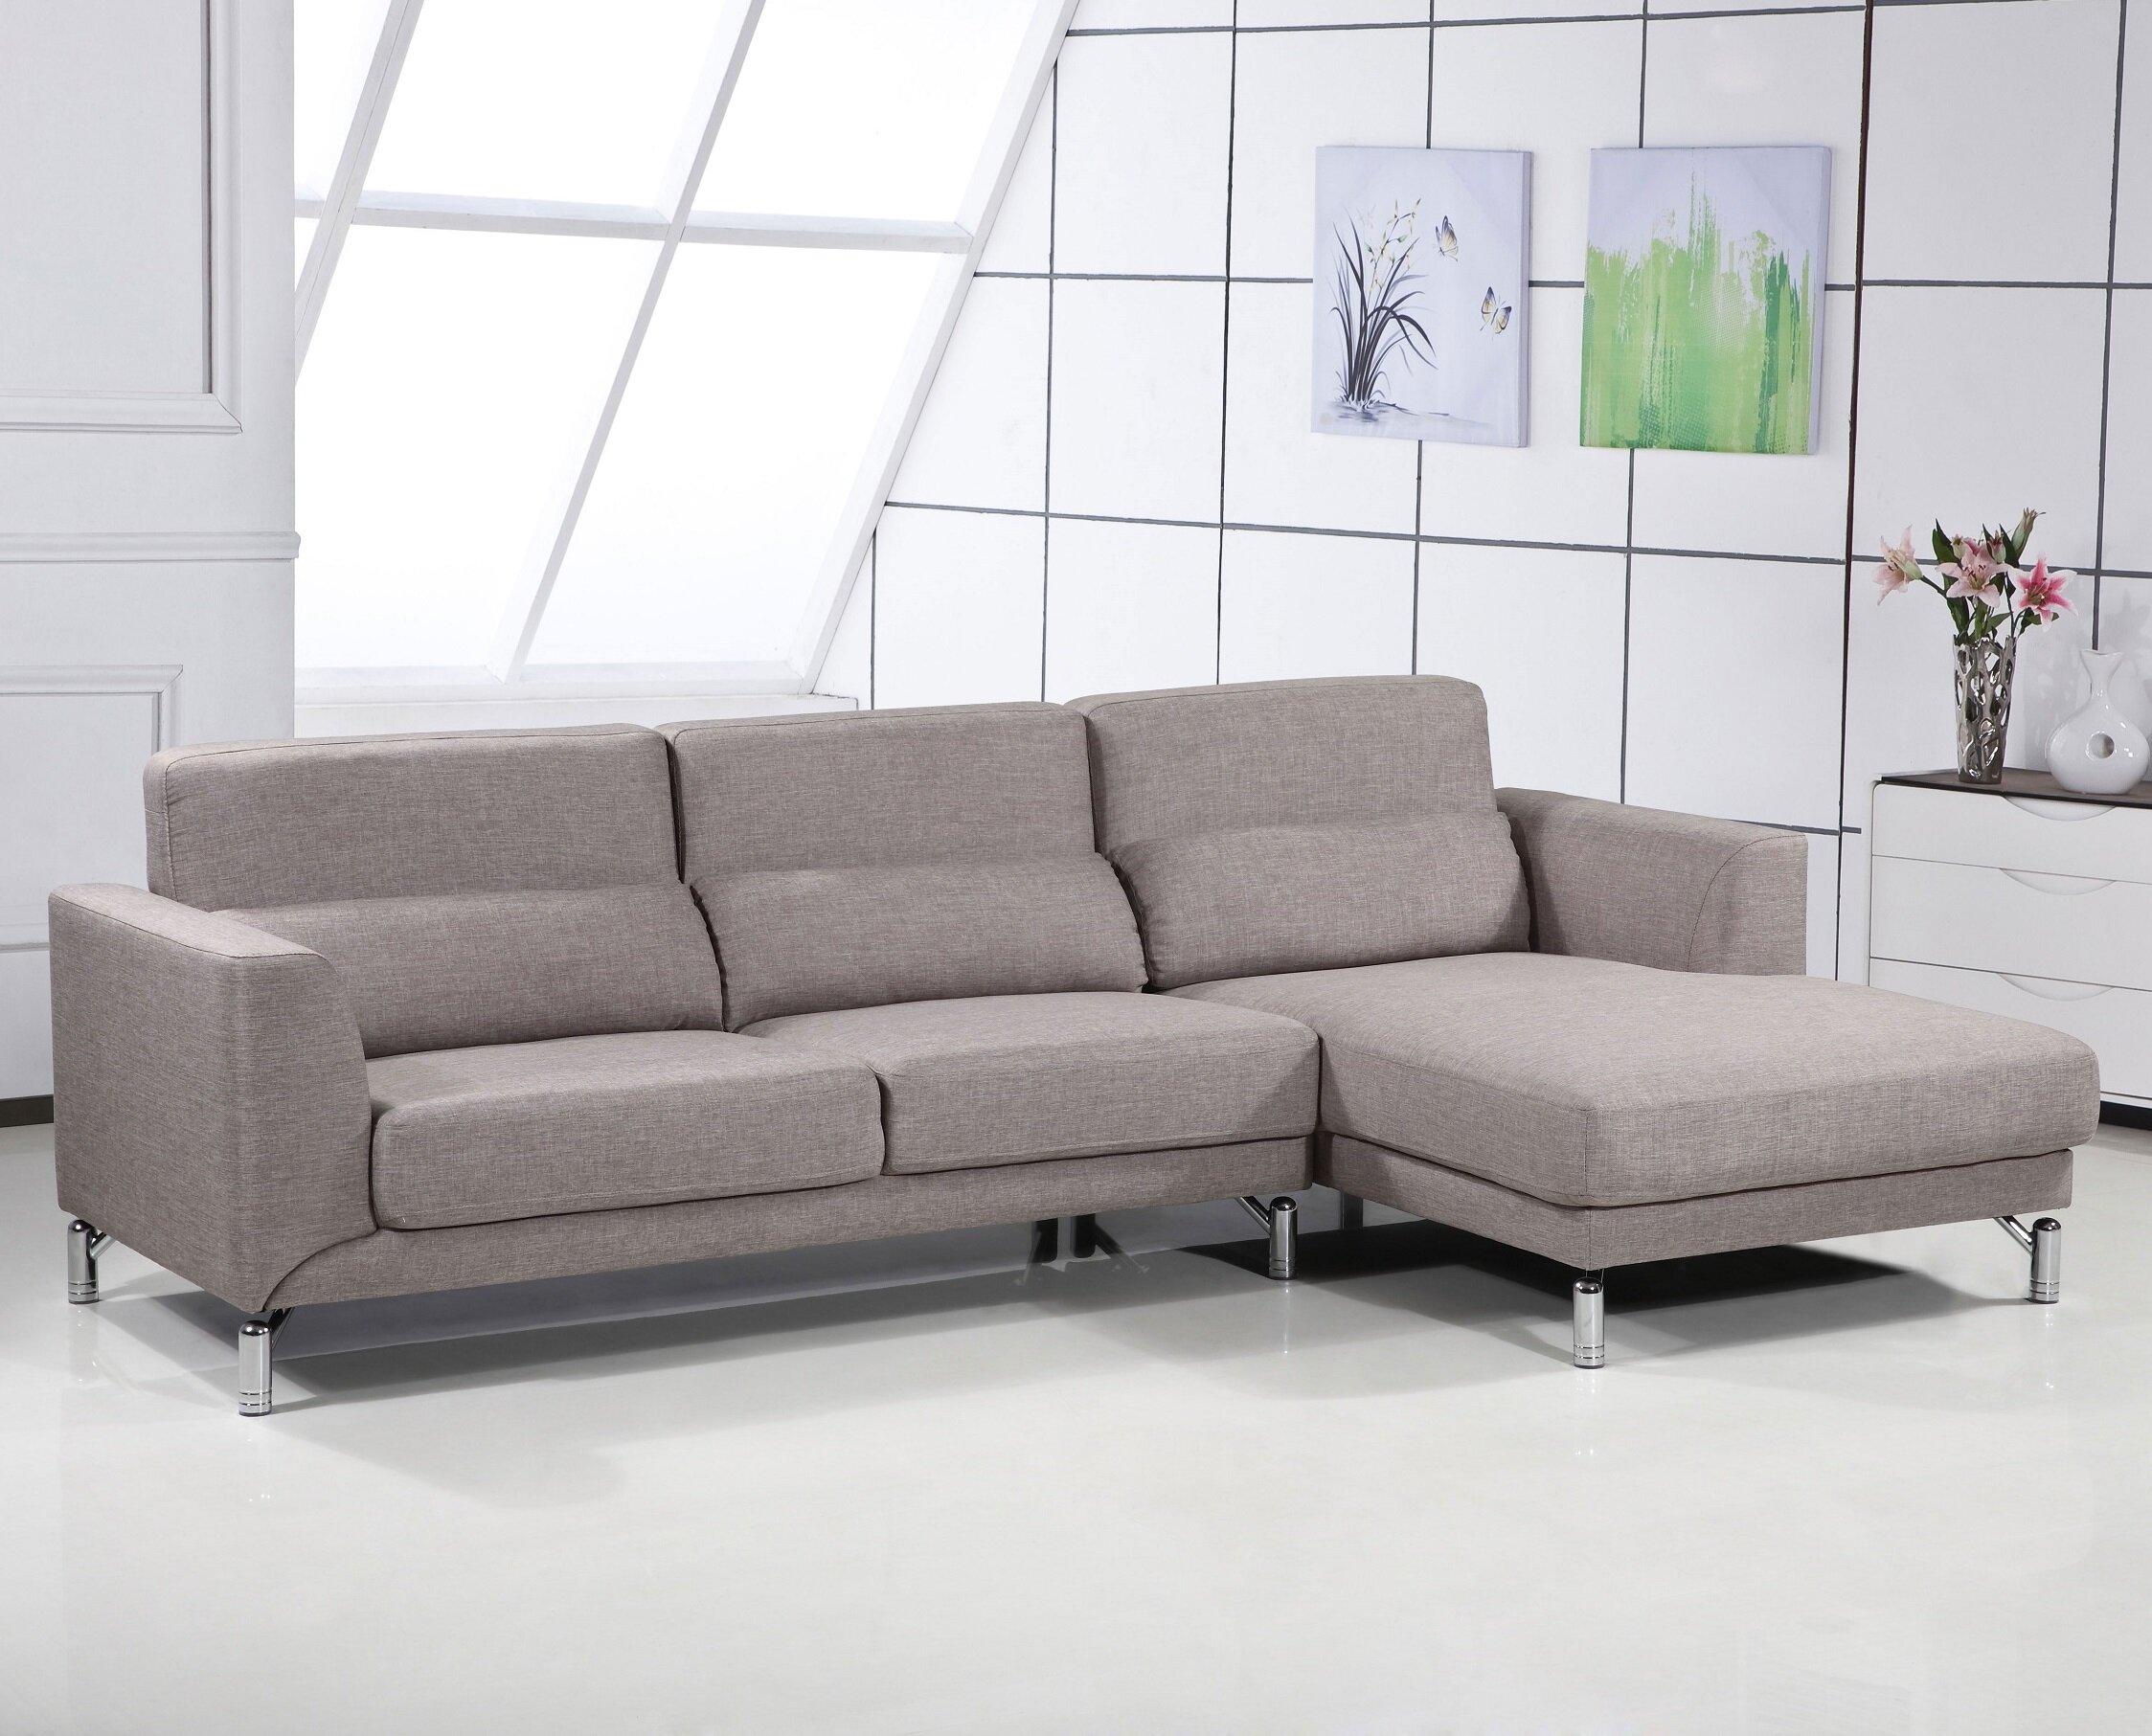 Incredible Liesel Sectional Creativecarmelina Interior Chair Design Creativecarmelinacom